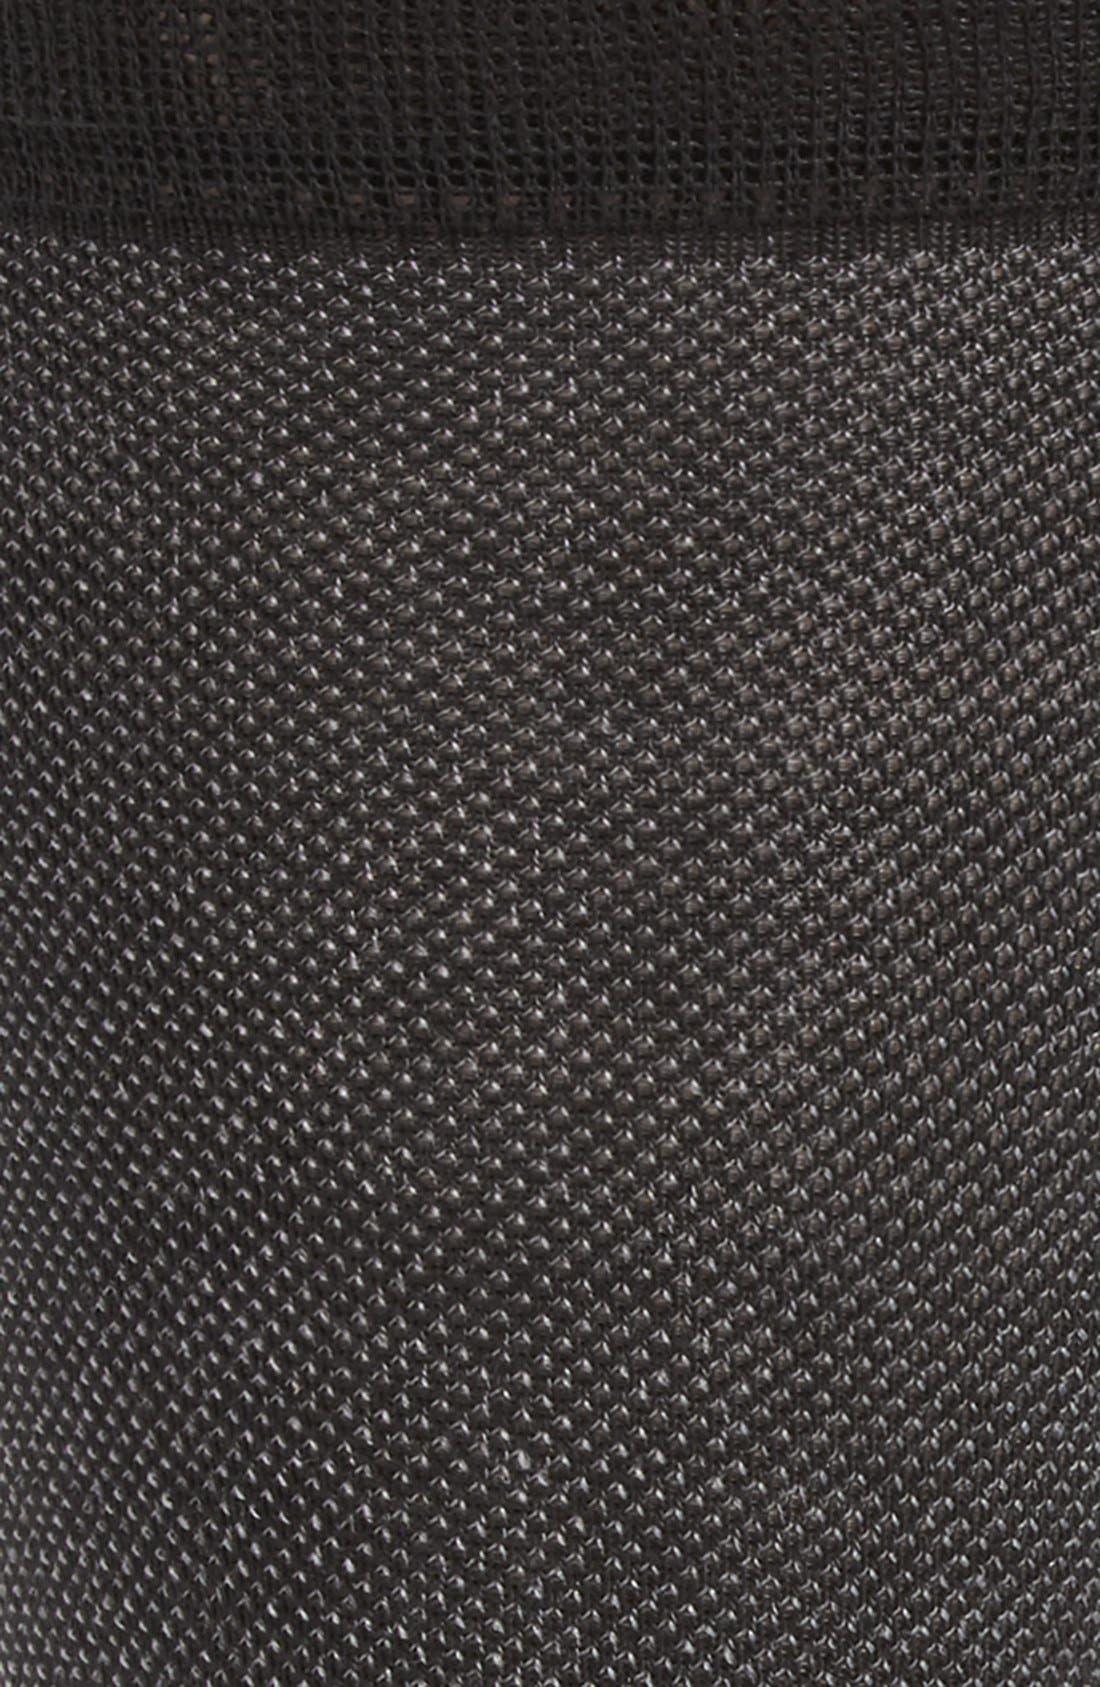 Piqué Texture Crew Socks,                             Alternate thumbnail 2, color,                             Black